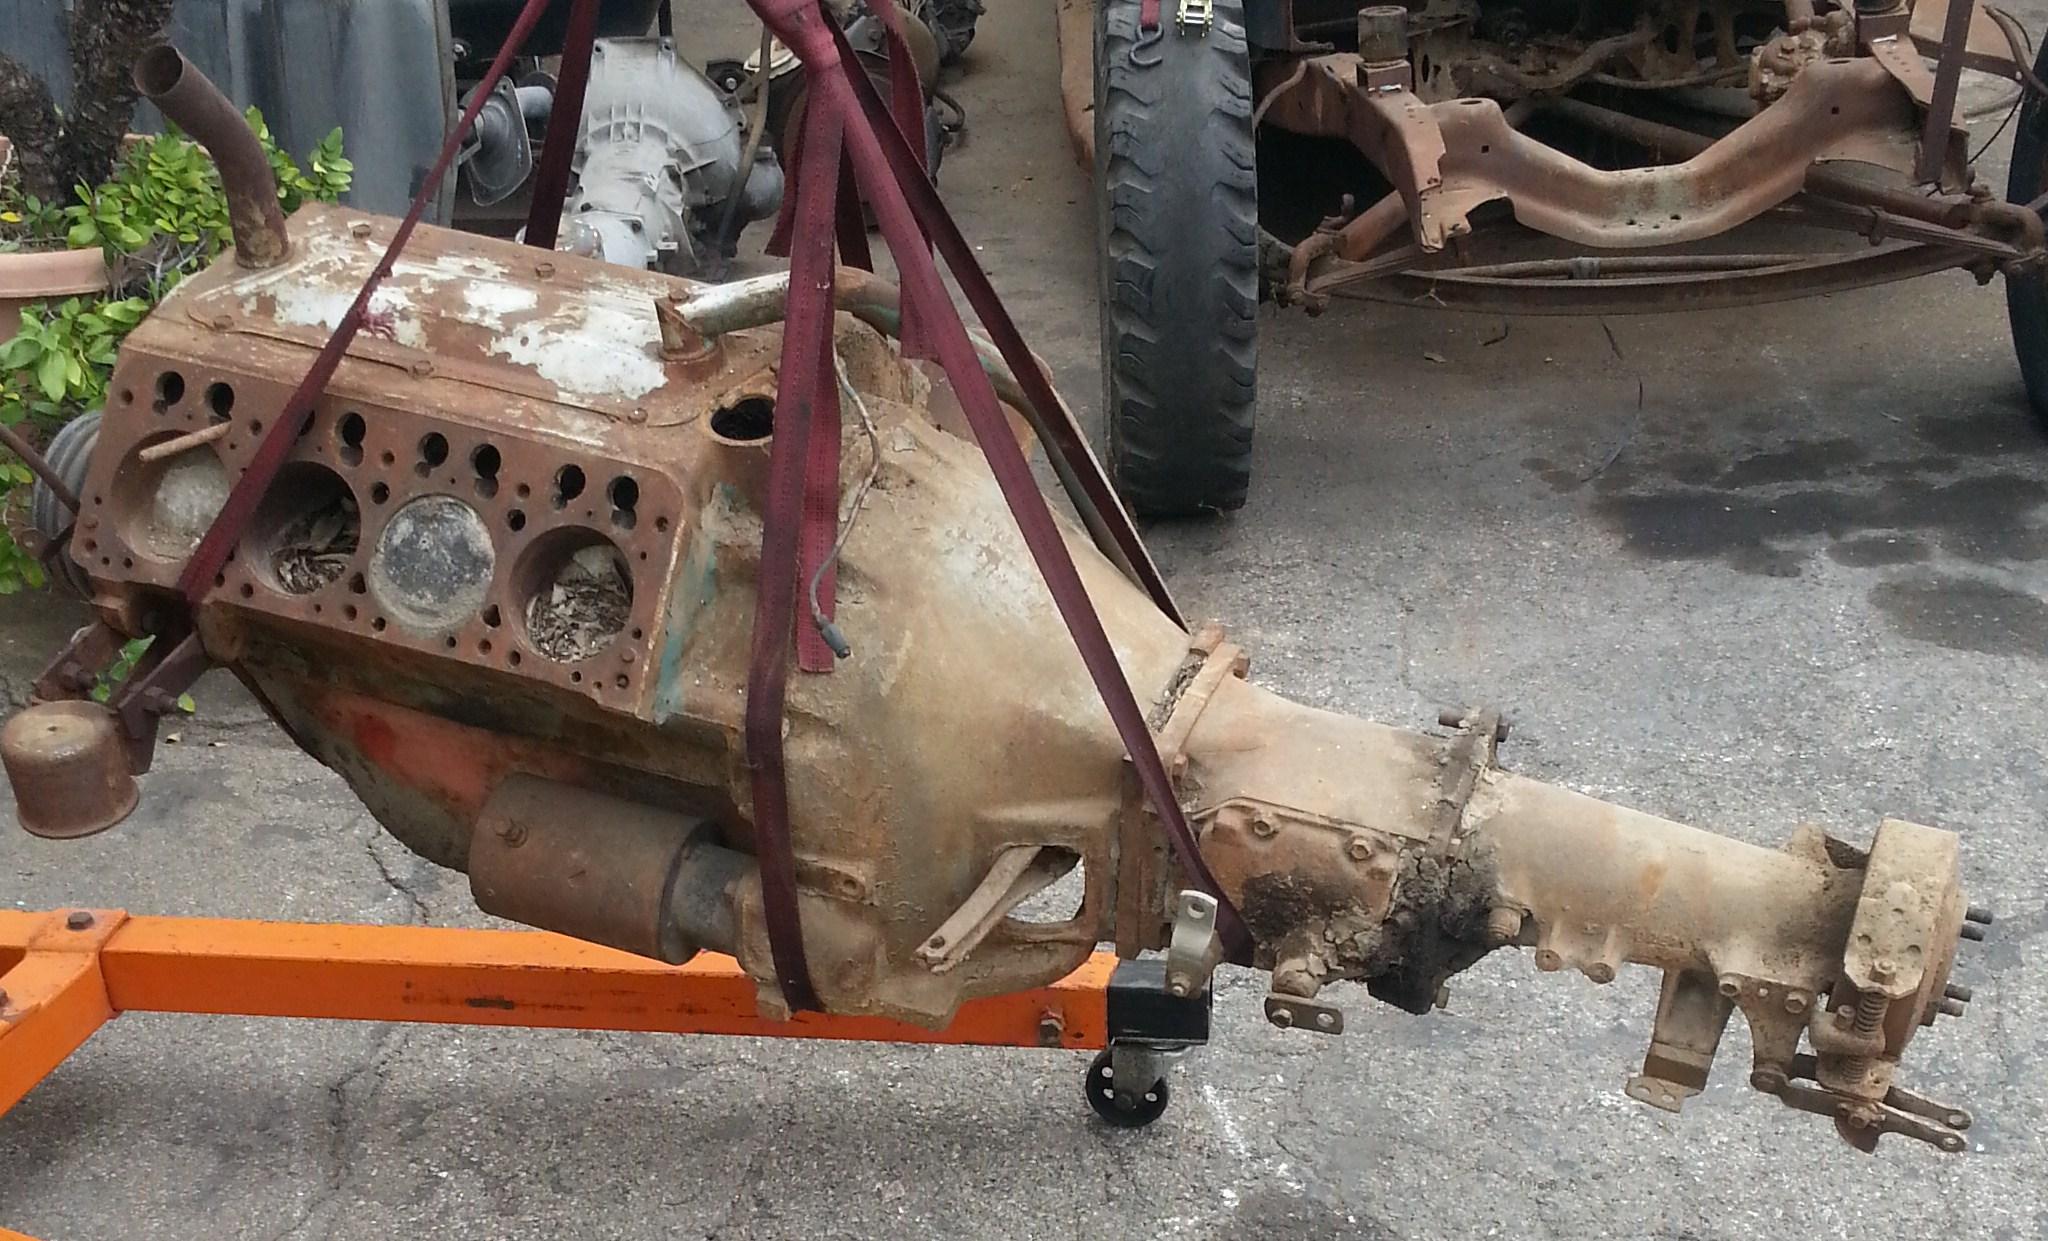 57 Desoto Hemi  U0026 3 Speed Transmission